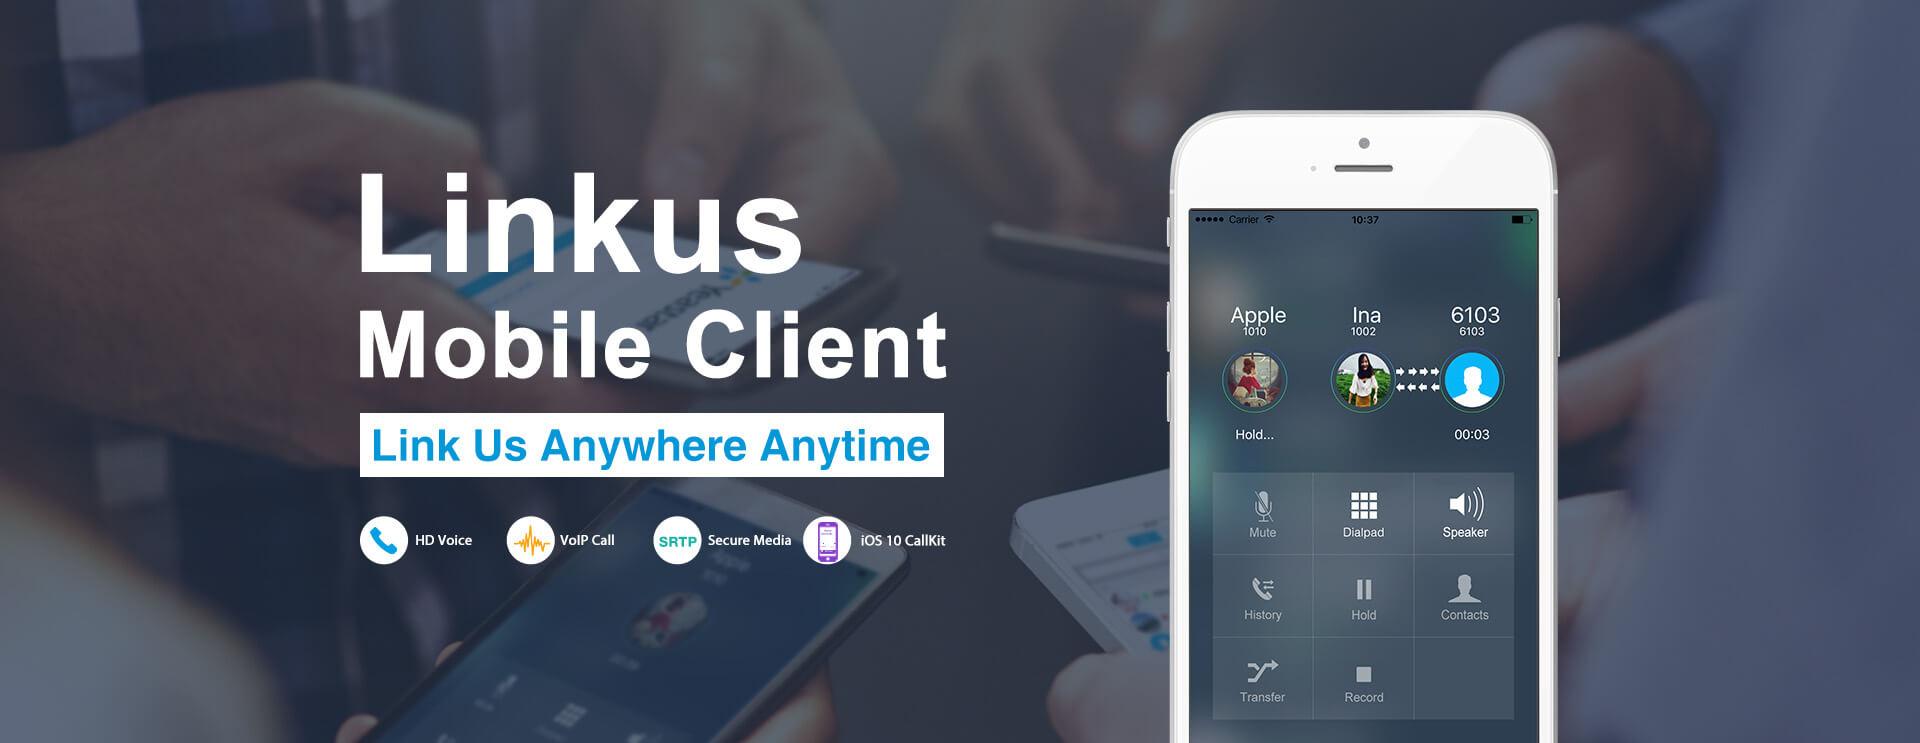 Linkus-mobile-client-banner1